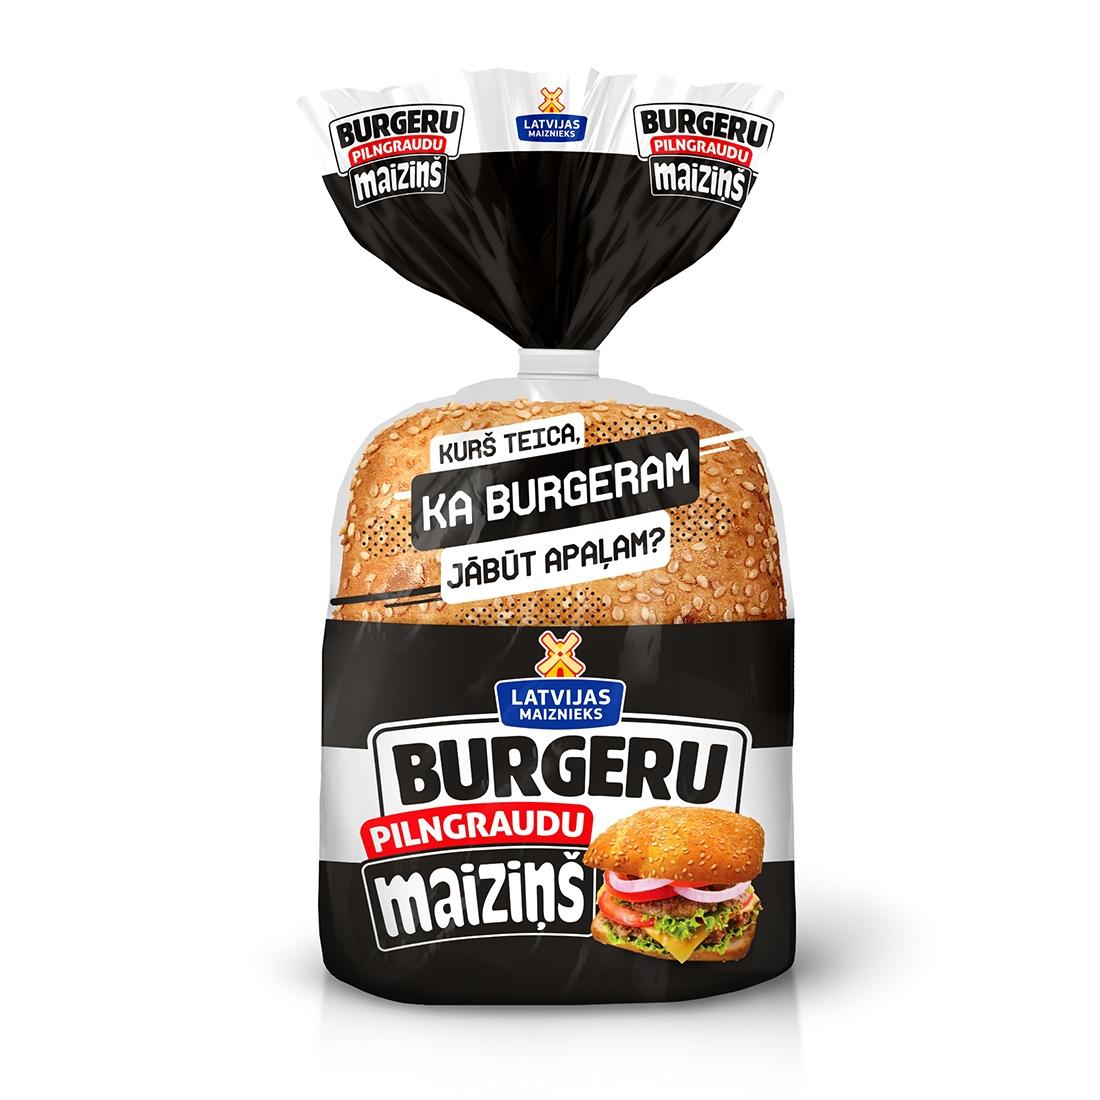 Maiziņš цельное зерно Бургер 240 г